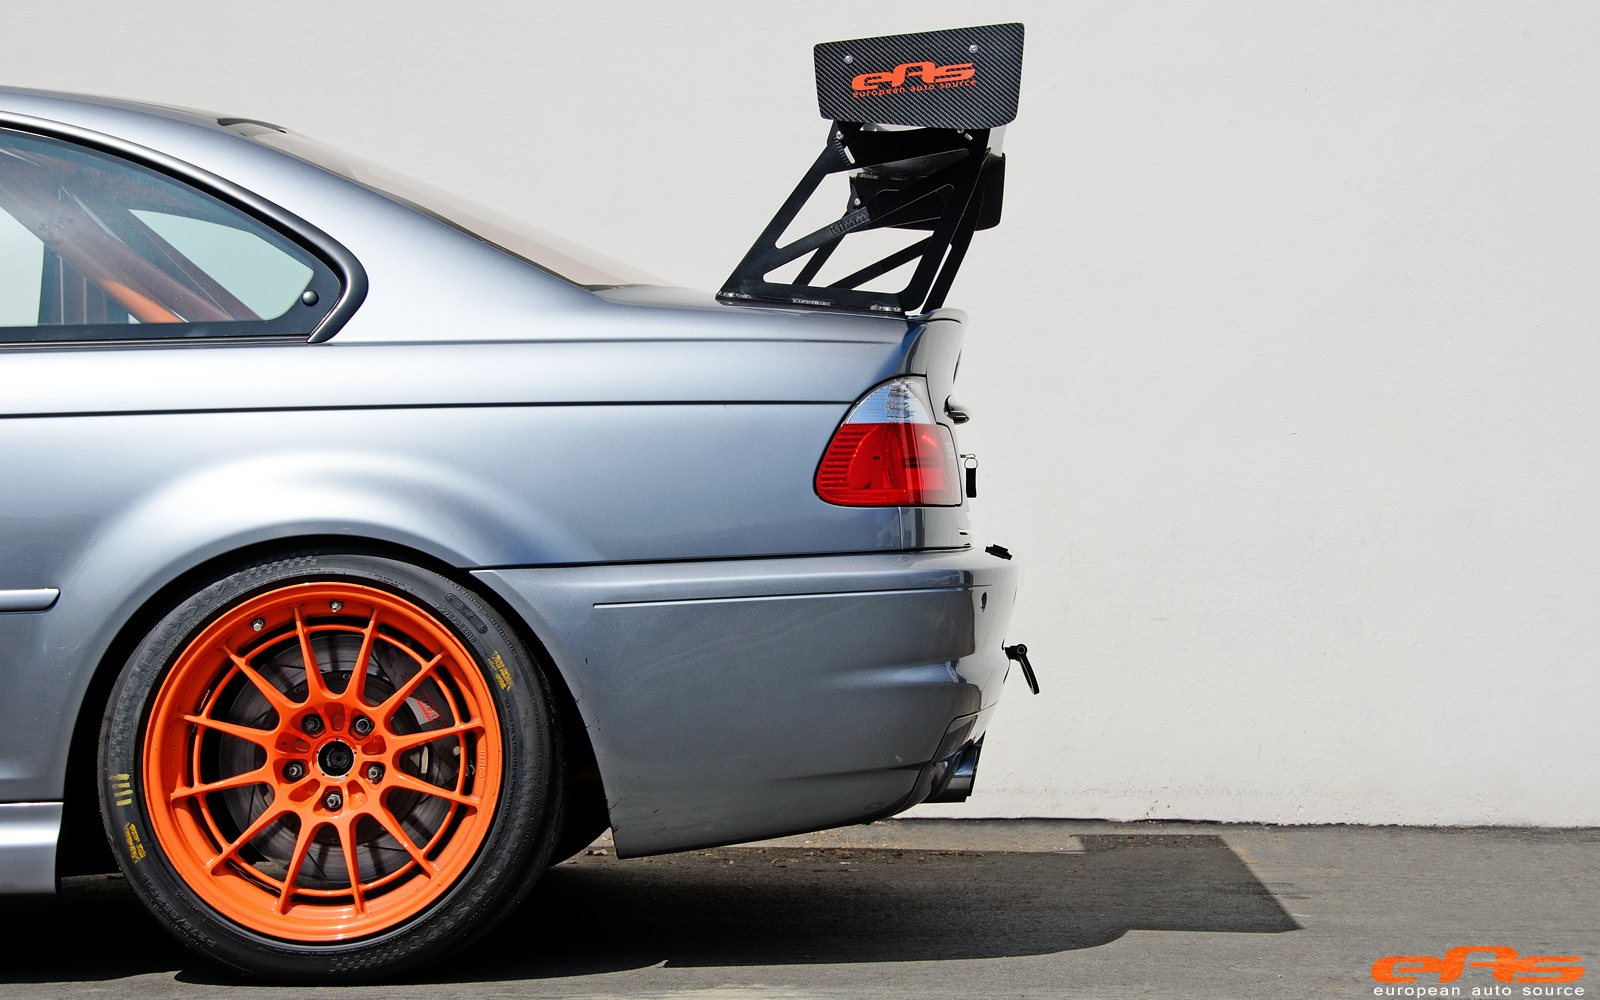 Track Spec Bmw E46 M3 Gets Supercharger At Eas Autoevolution